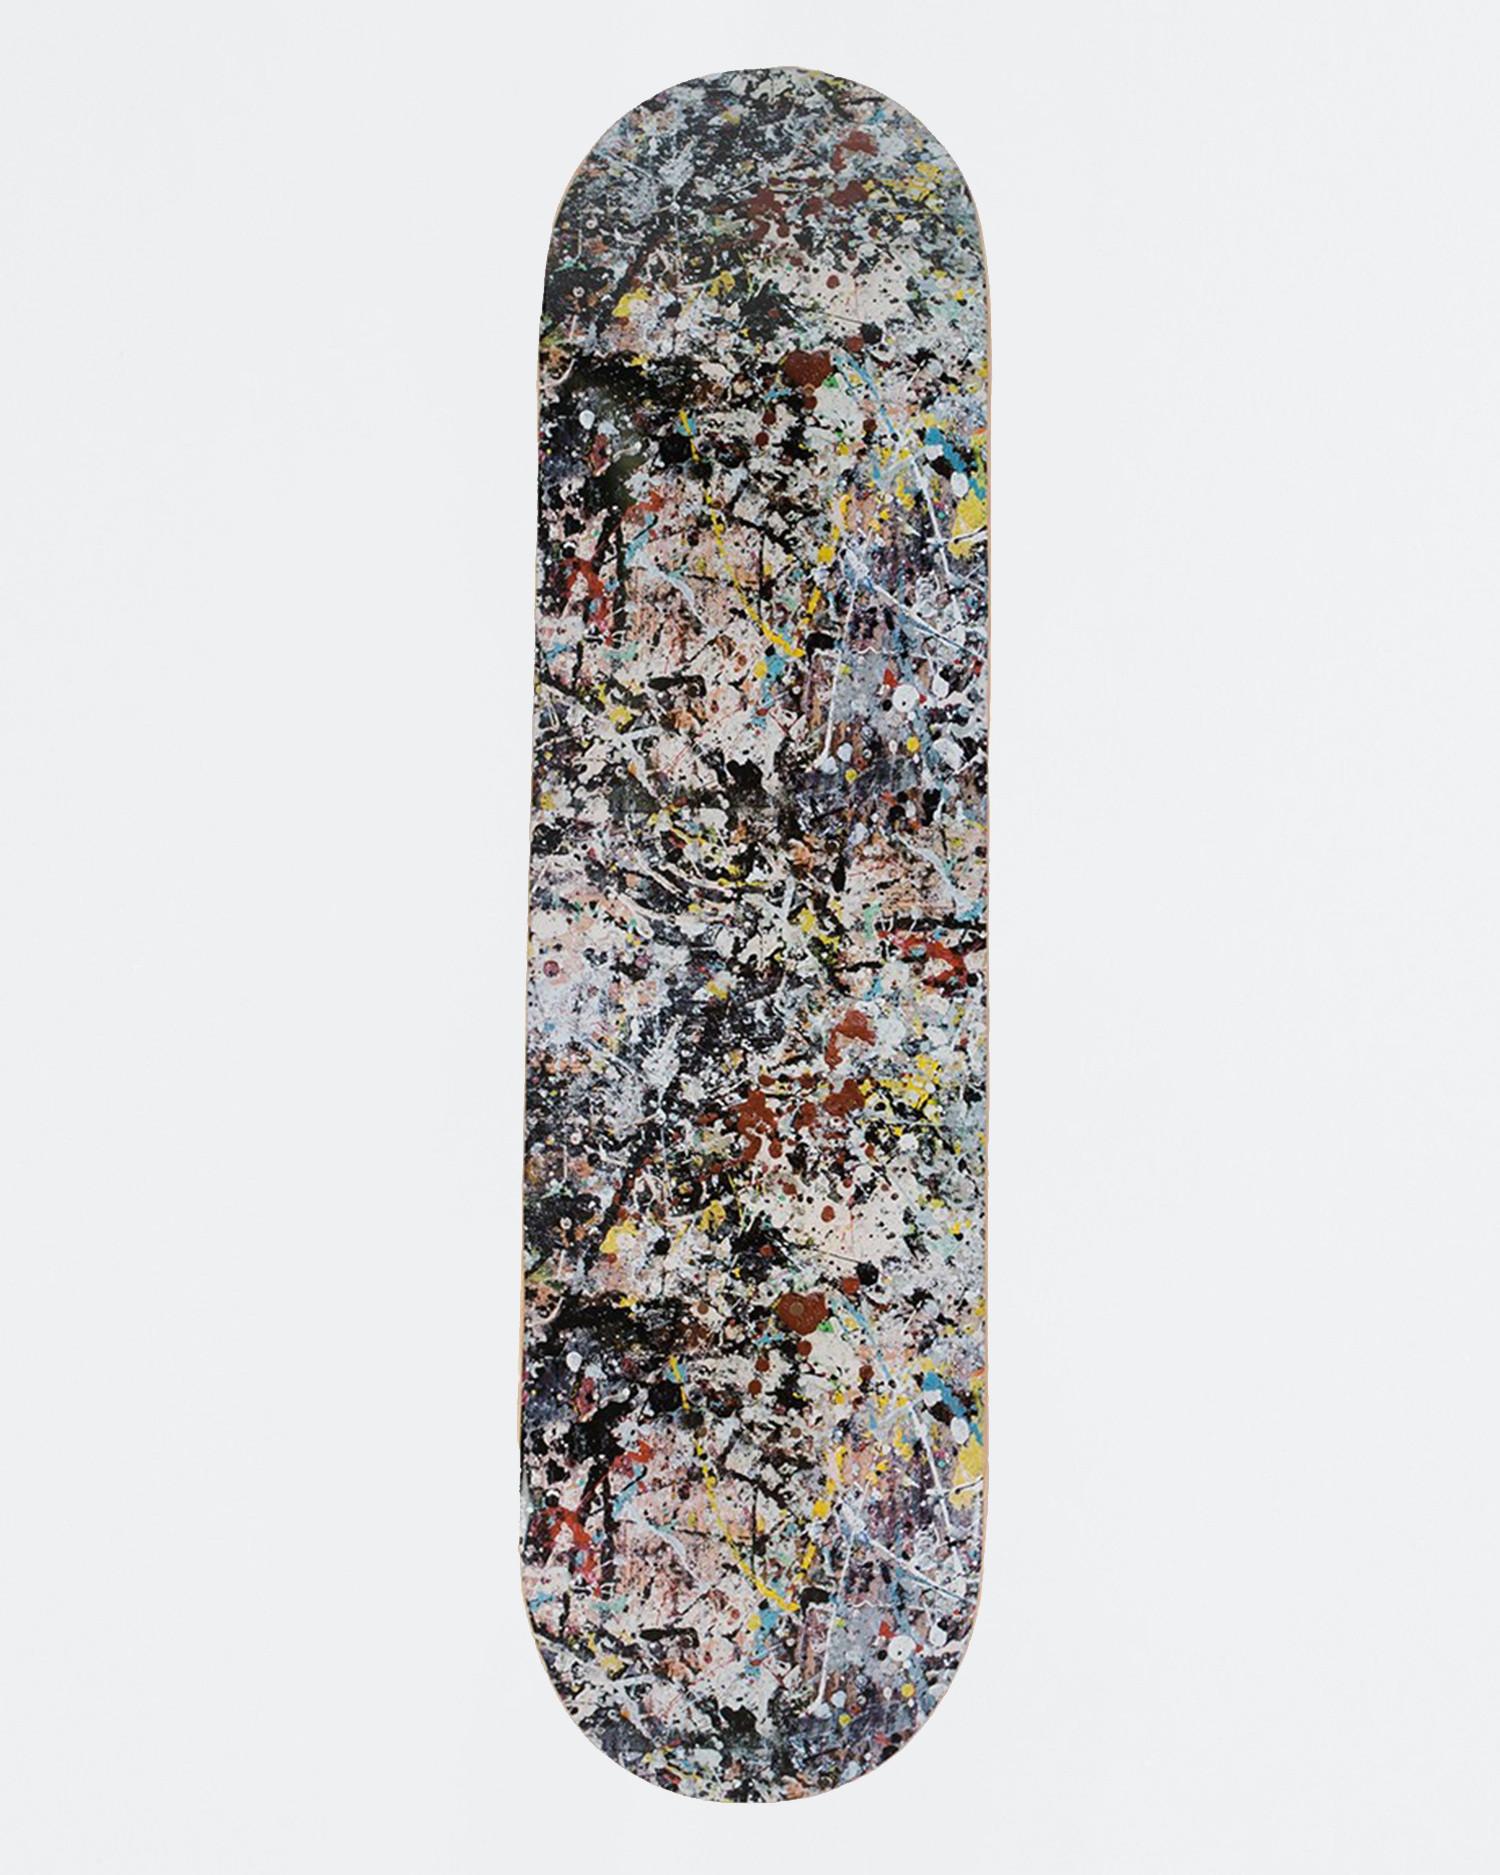 Sync x Jackson Pollock Studio Deck 2